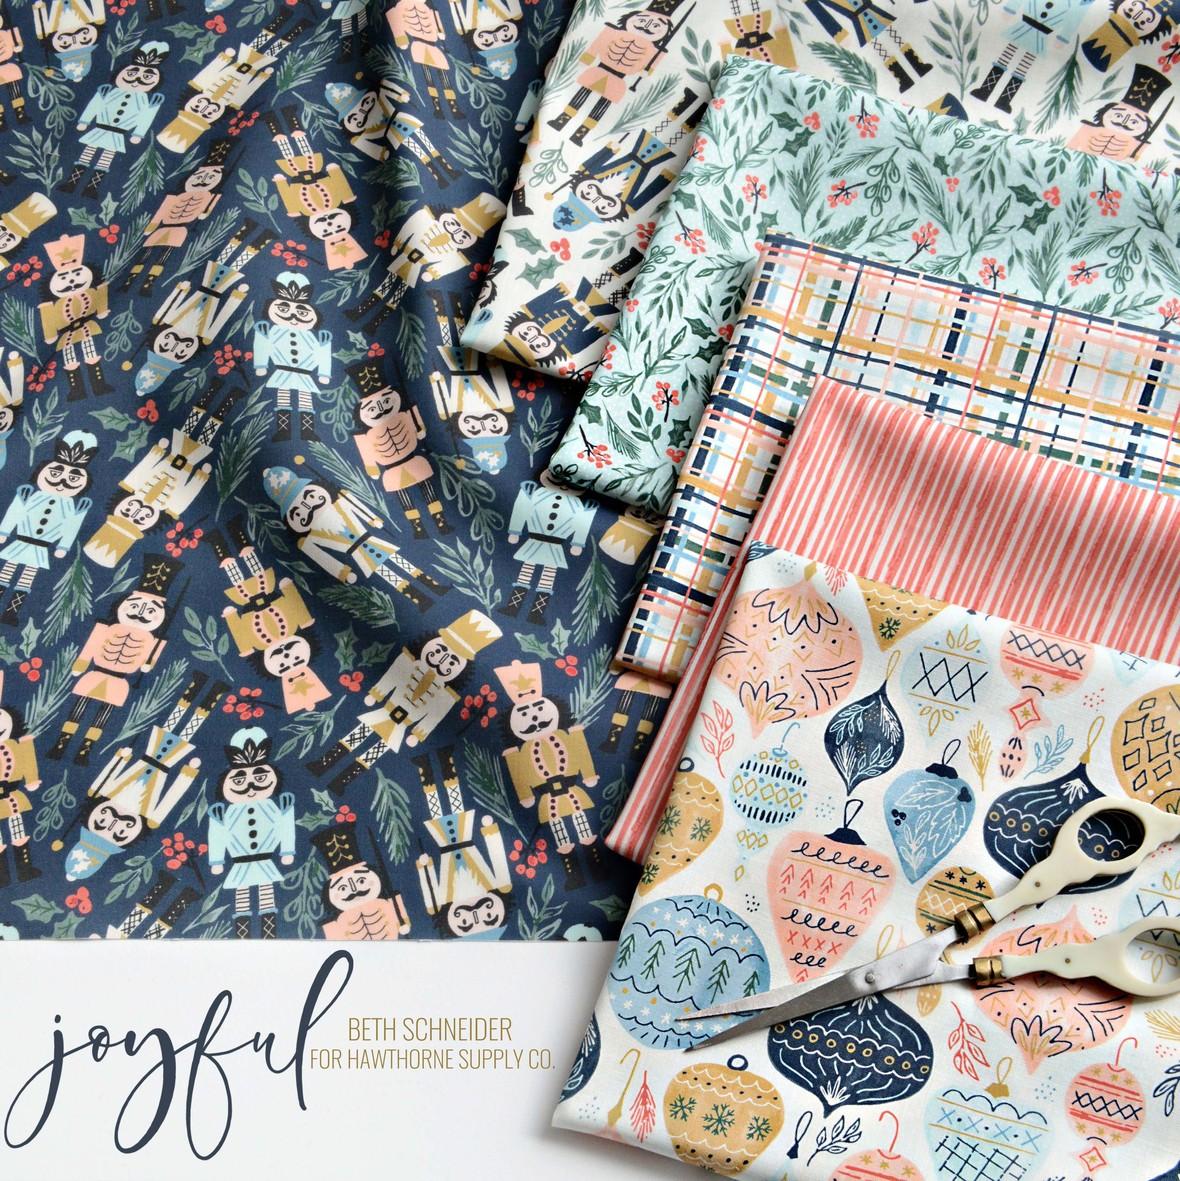 Joyful Fabric Poster Beth Schneider for Hawthorne Supply Co Christmas Fabric